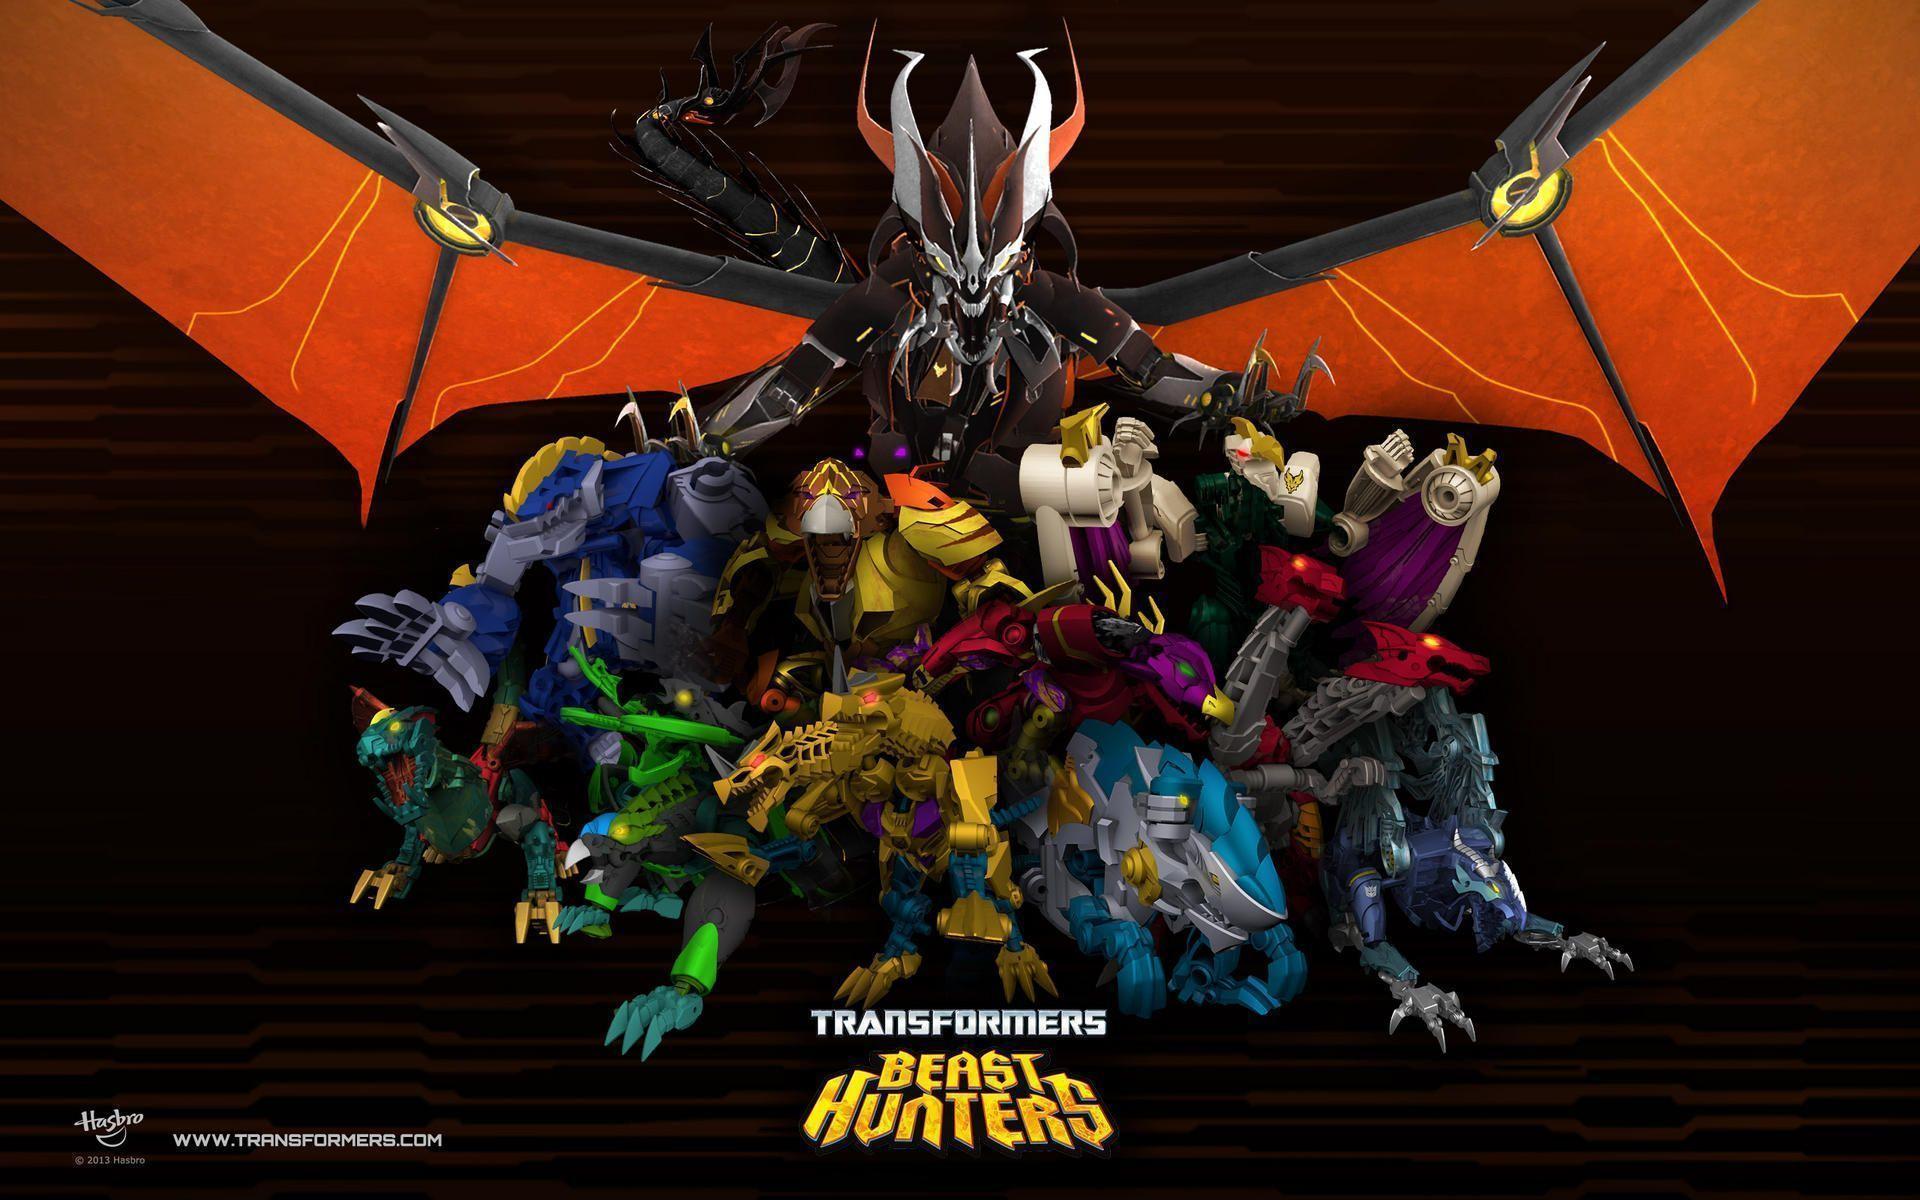 Transformers prime wallpapers hd wallpaper cave - Transformers prime wallpaper ...